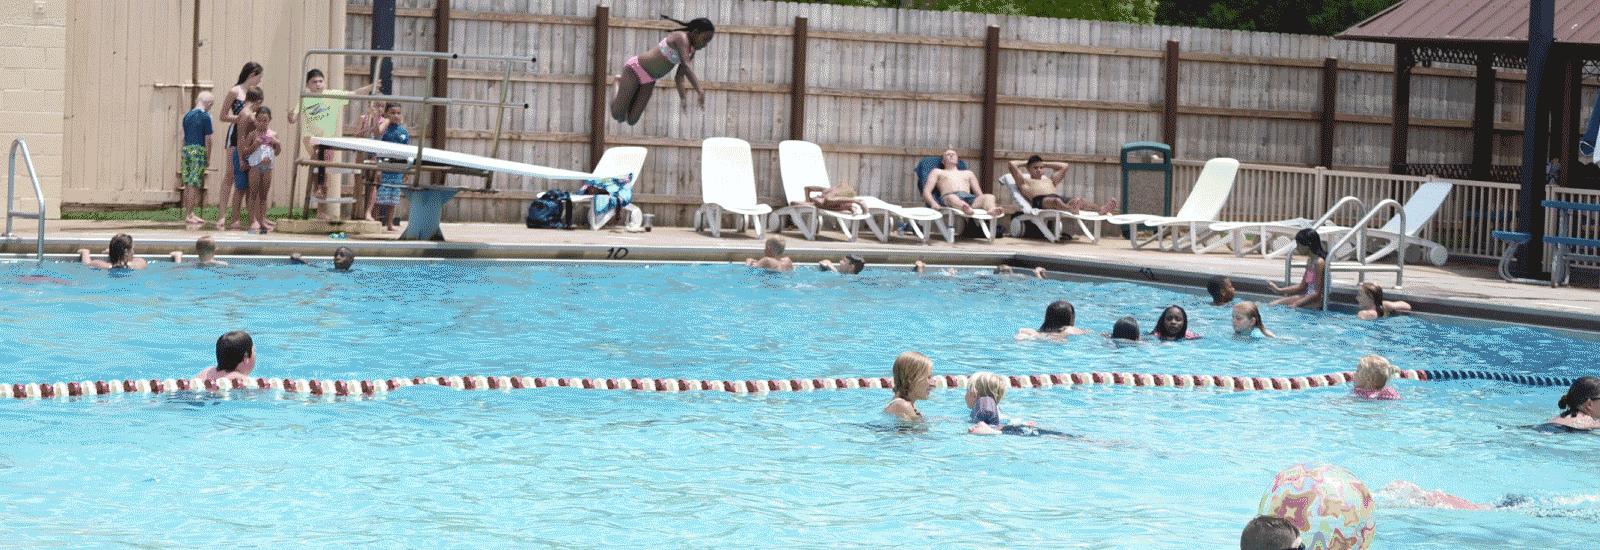 Tinker AFB Pool